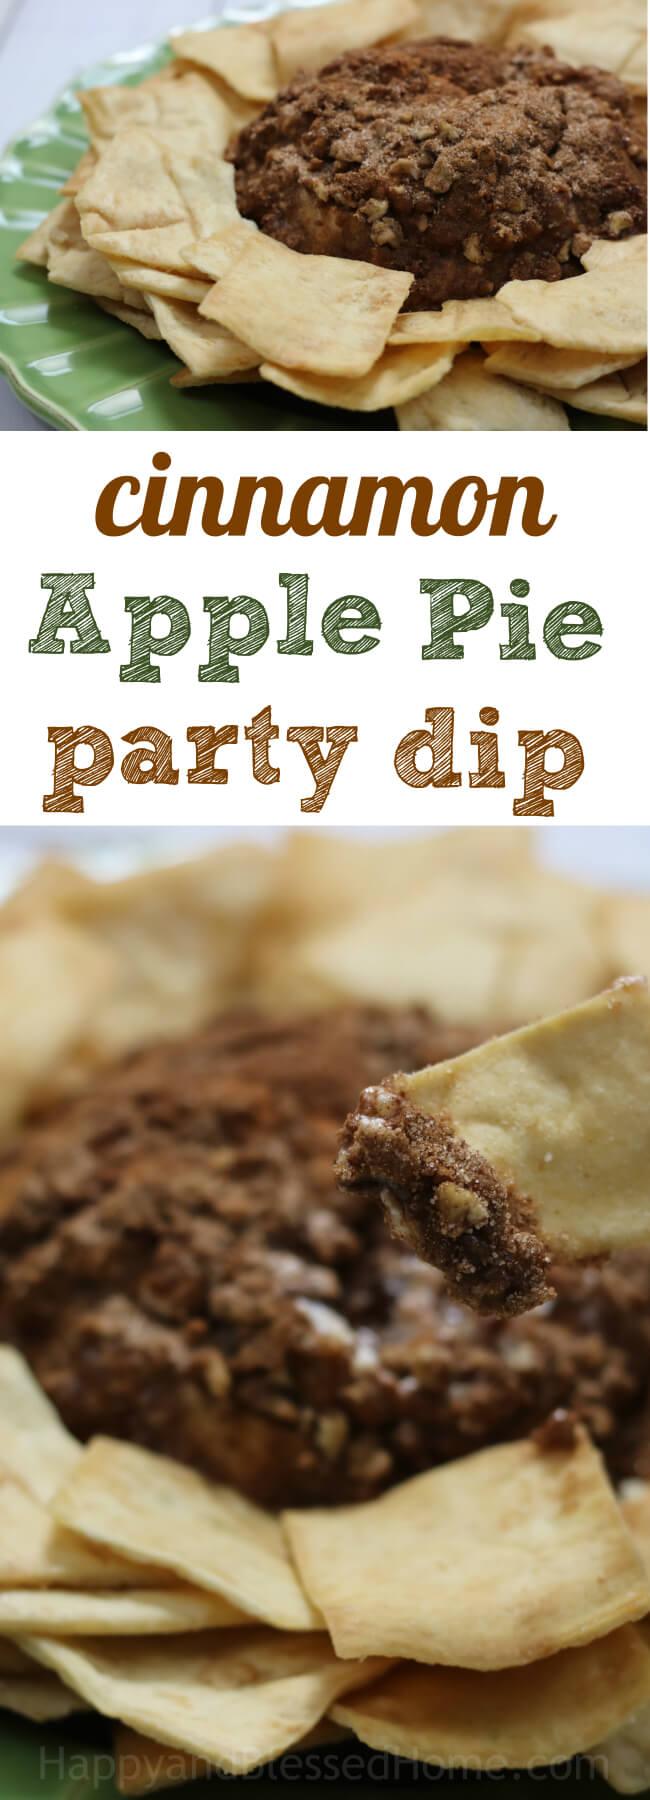 Easy party dip recipe - Cinnamon Apple Pie - tastes like cinnamon sugar pretzels but in a dip